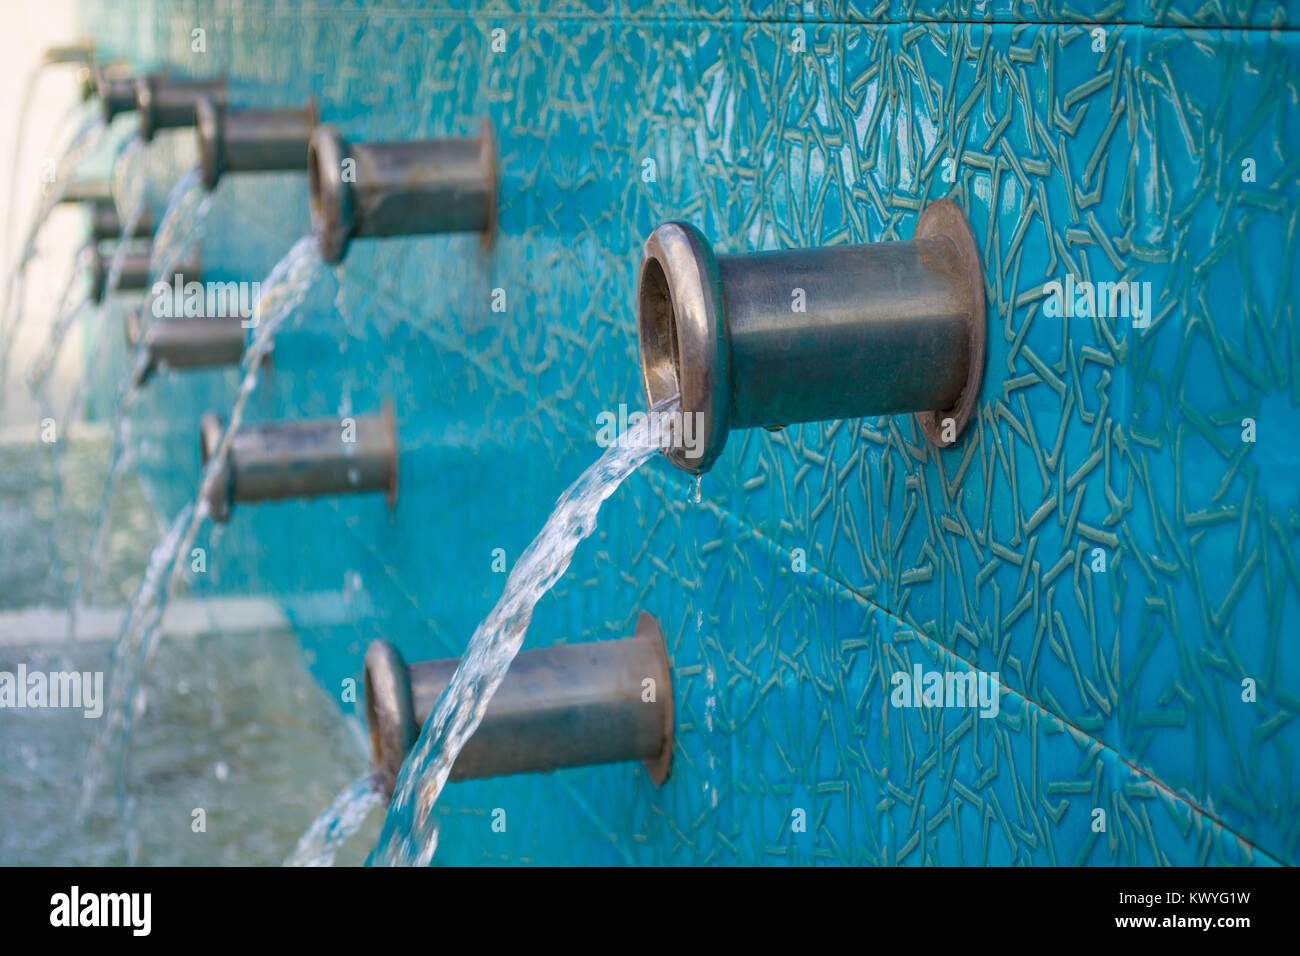 Vintage Outdoor Water Faucet Stock Photos & Vintage Outdoor Water ...